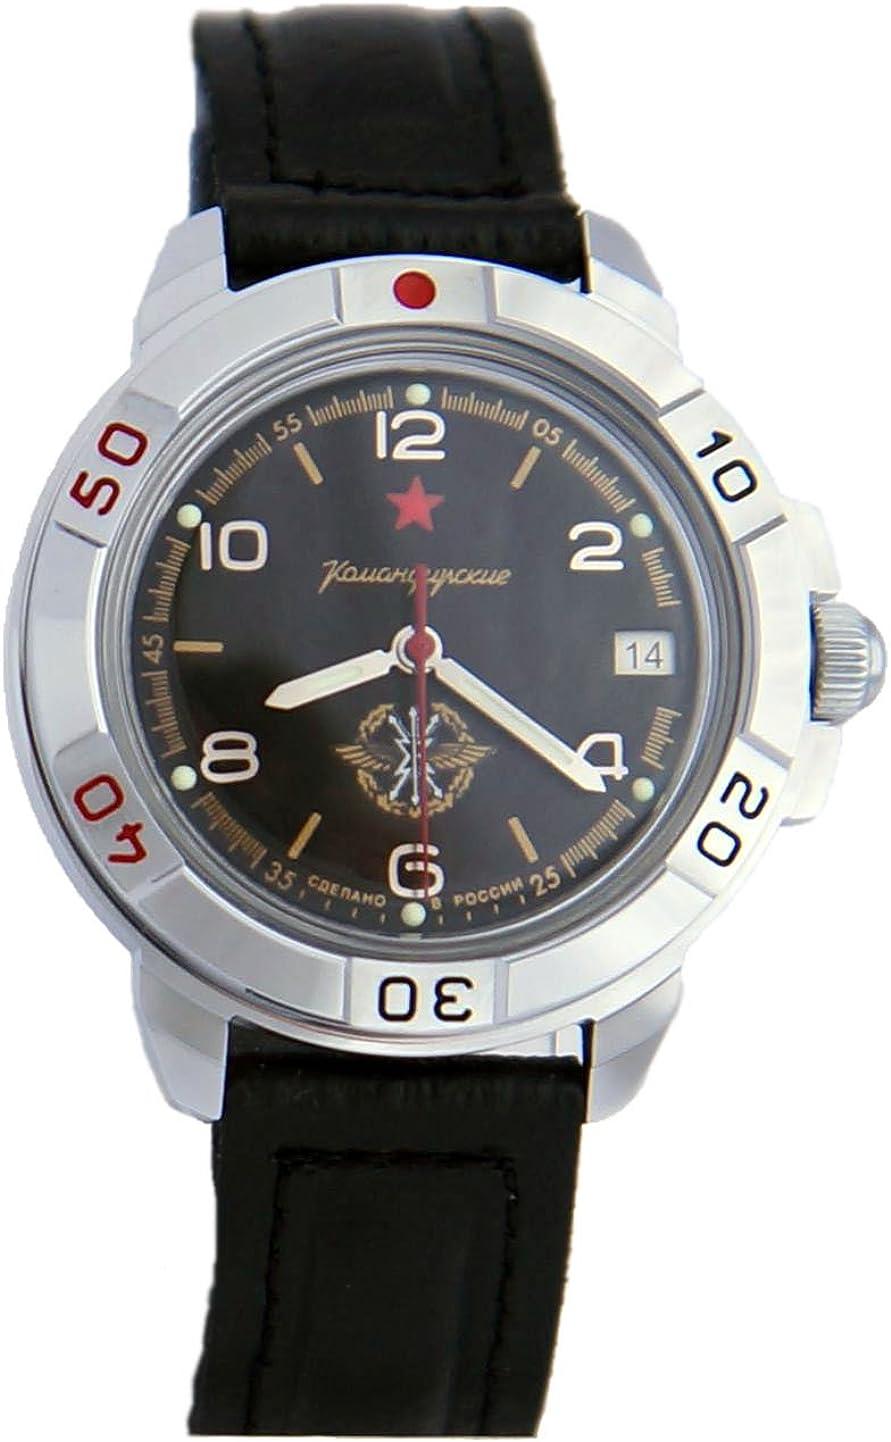 Vostok Komandirskie Military Russian Watch Signal Corps 2414 431296